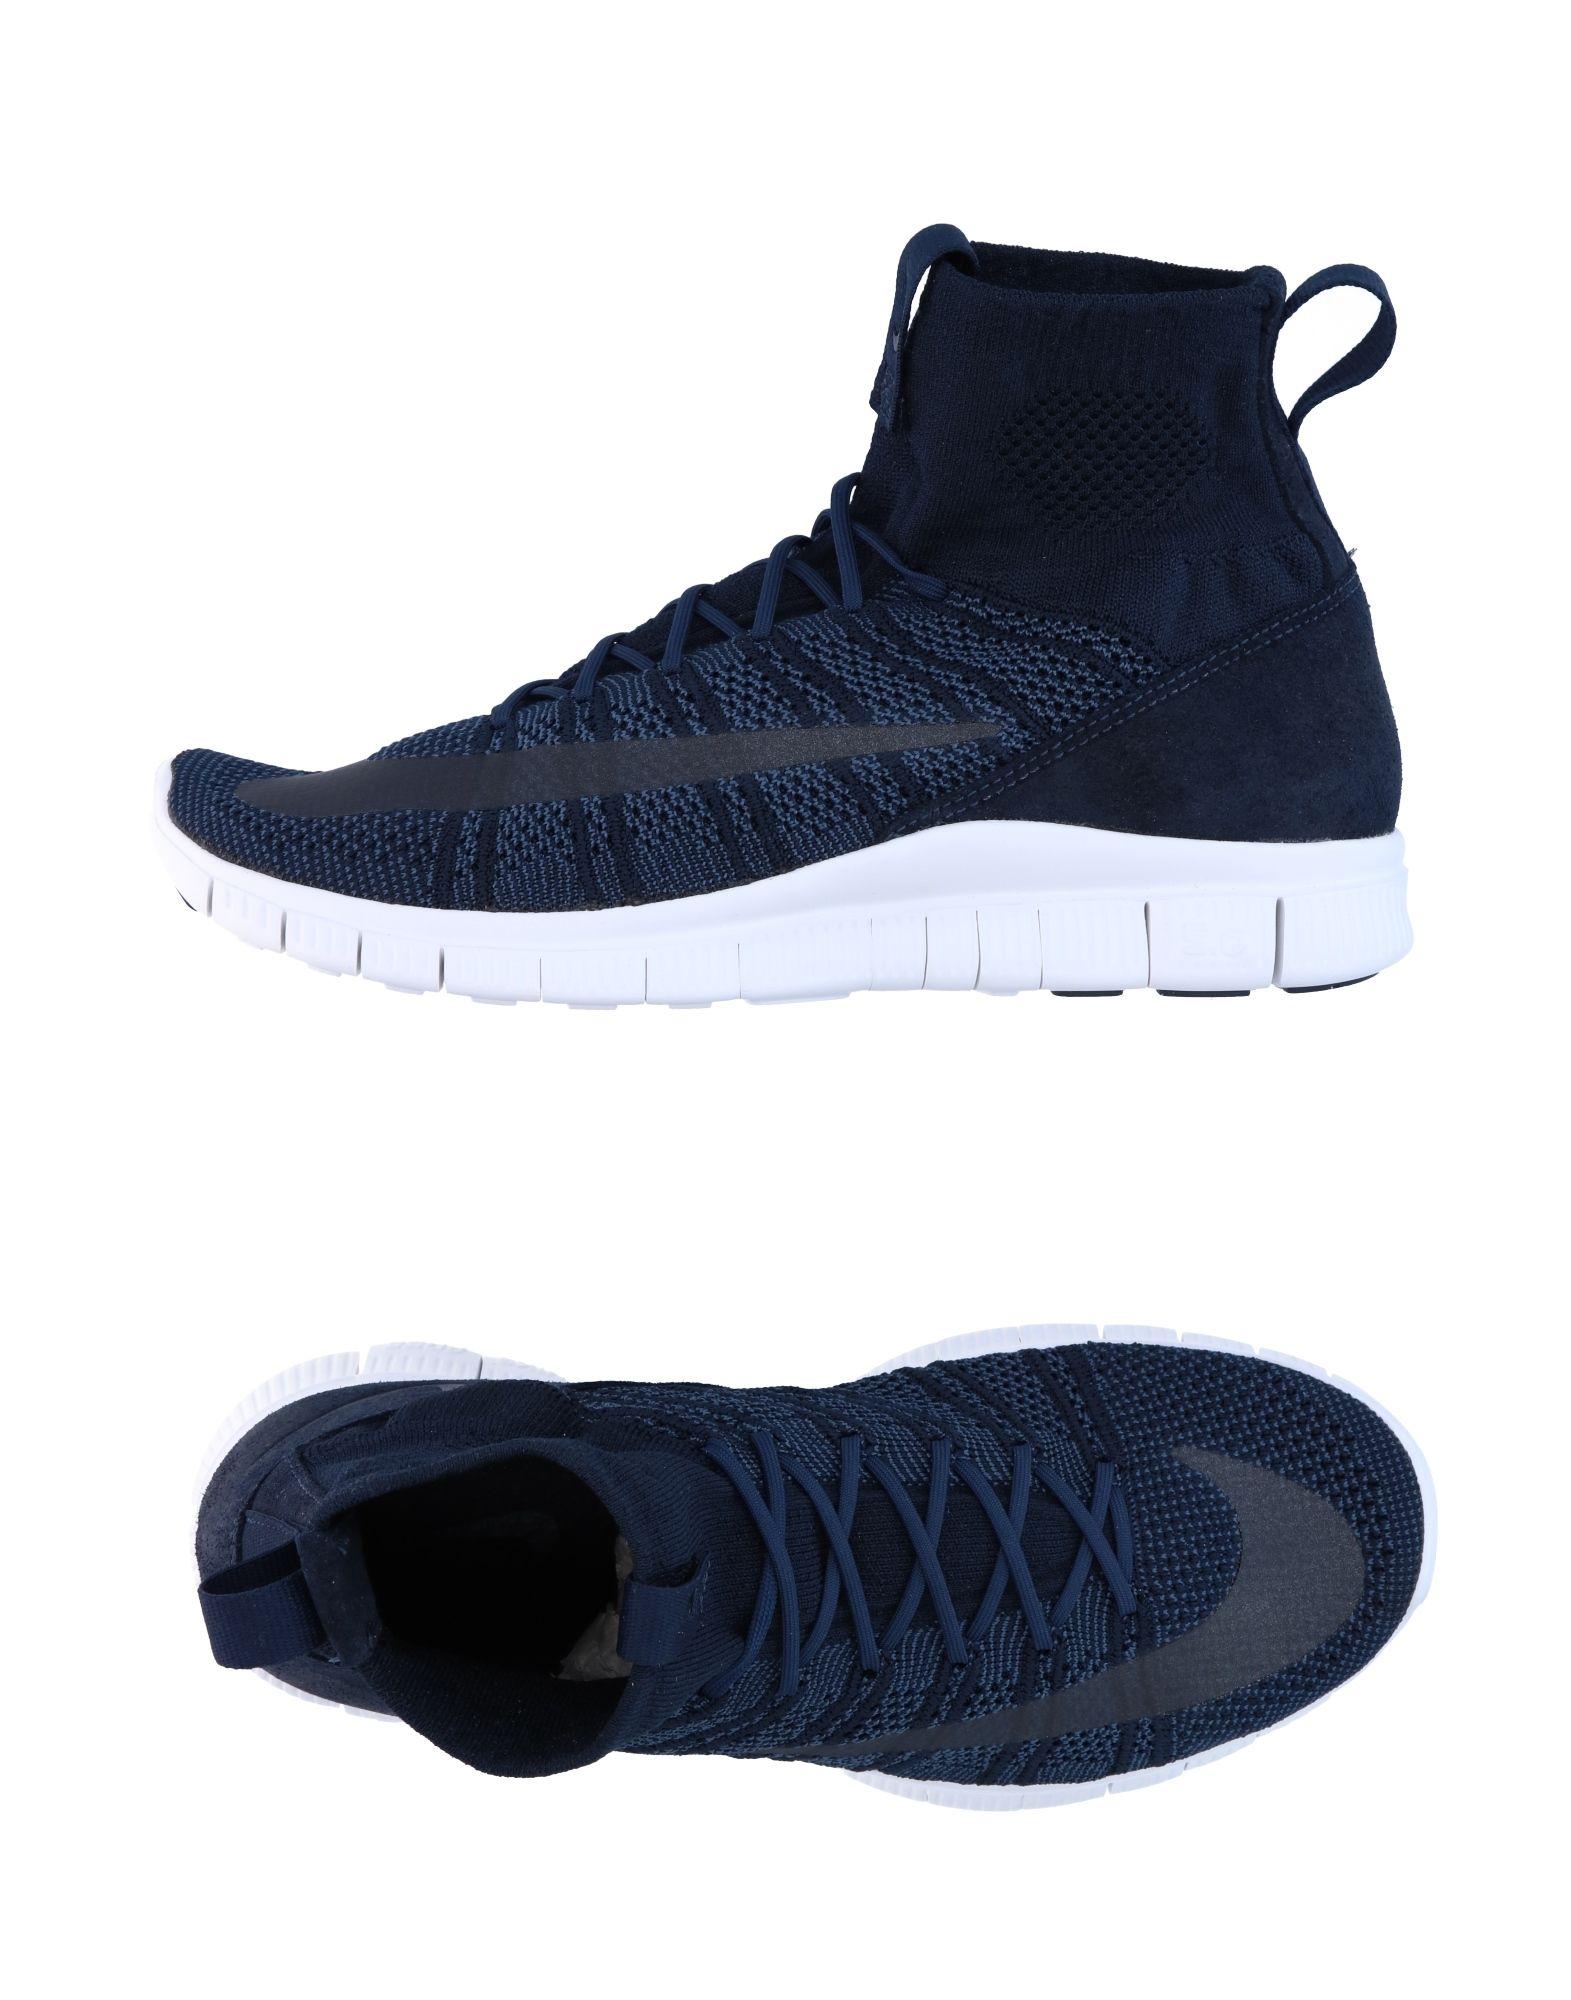 Nike Sneakers Herren  11245396FM Schuhe Gute Qualität beliebte Schuhe 11245396FM 072c74